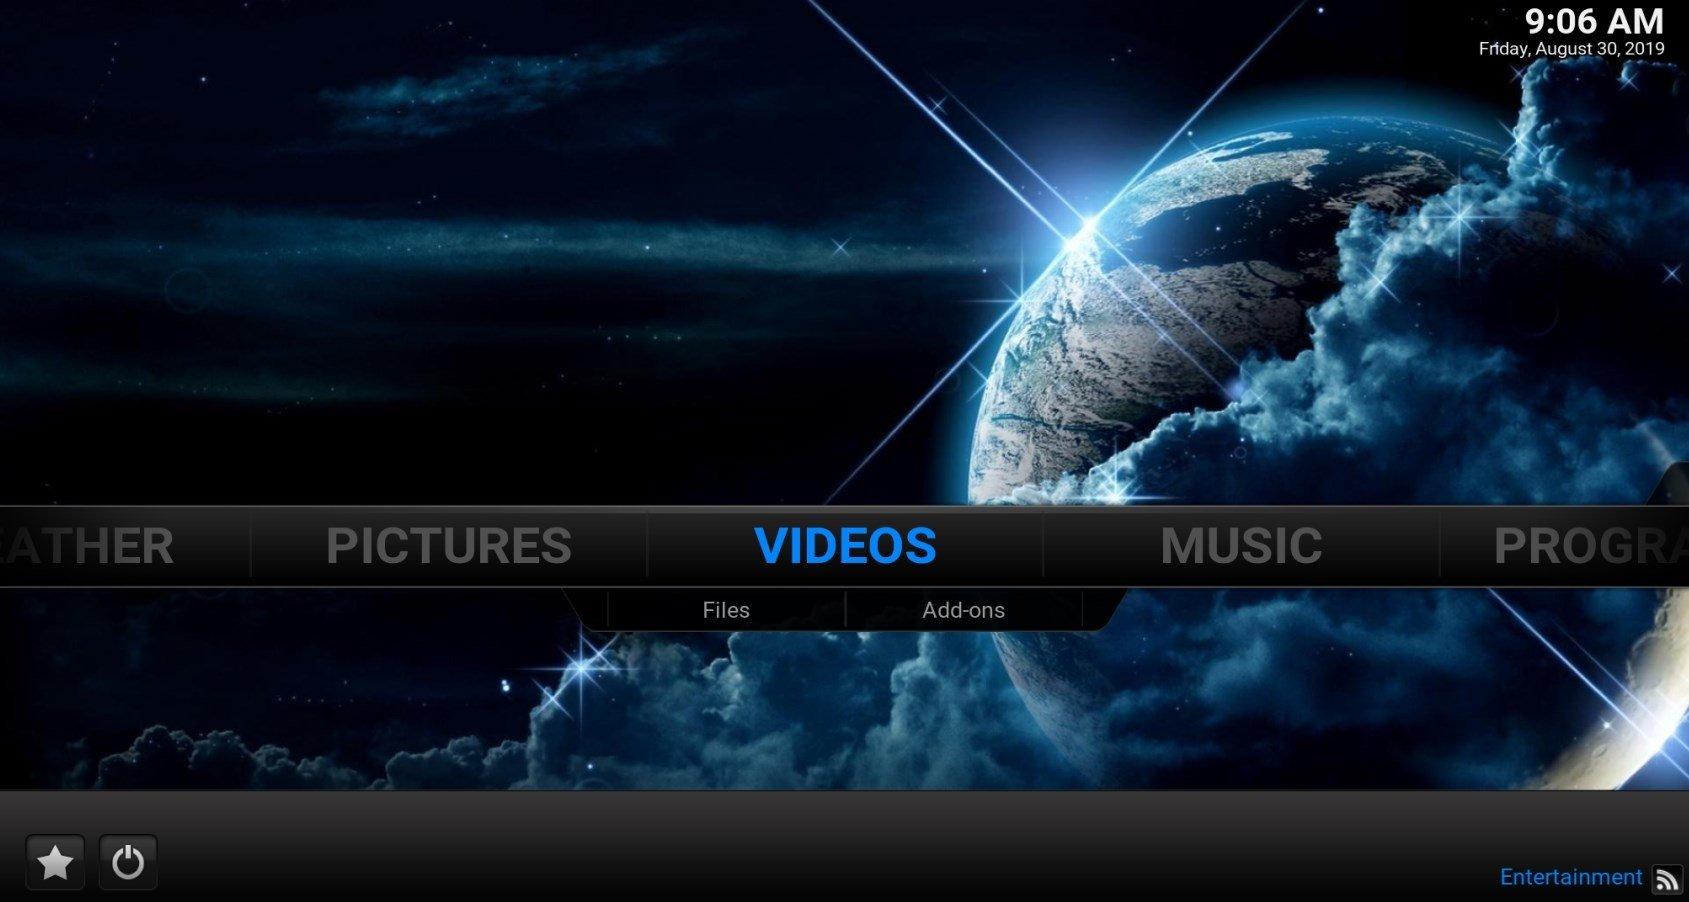 EBox MC 17 6F - Descargar para Android APK Gratis